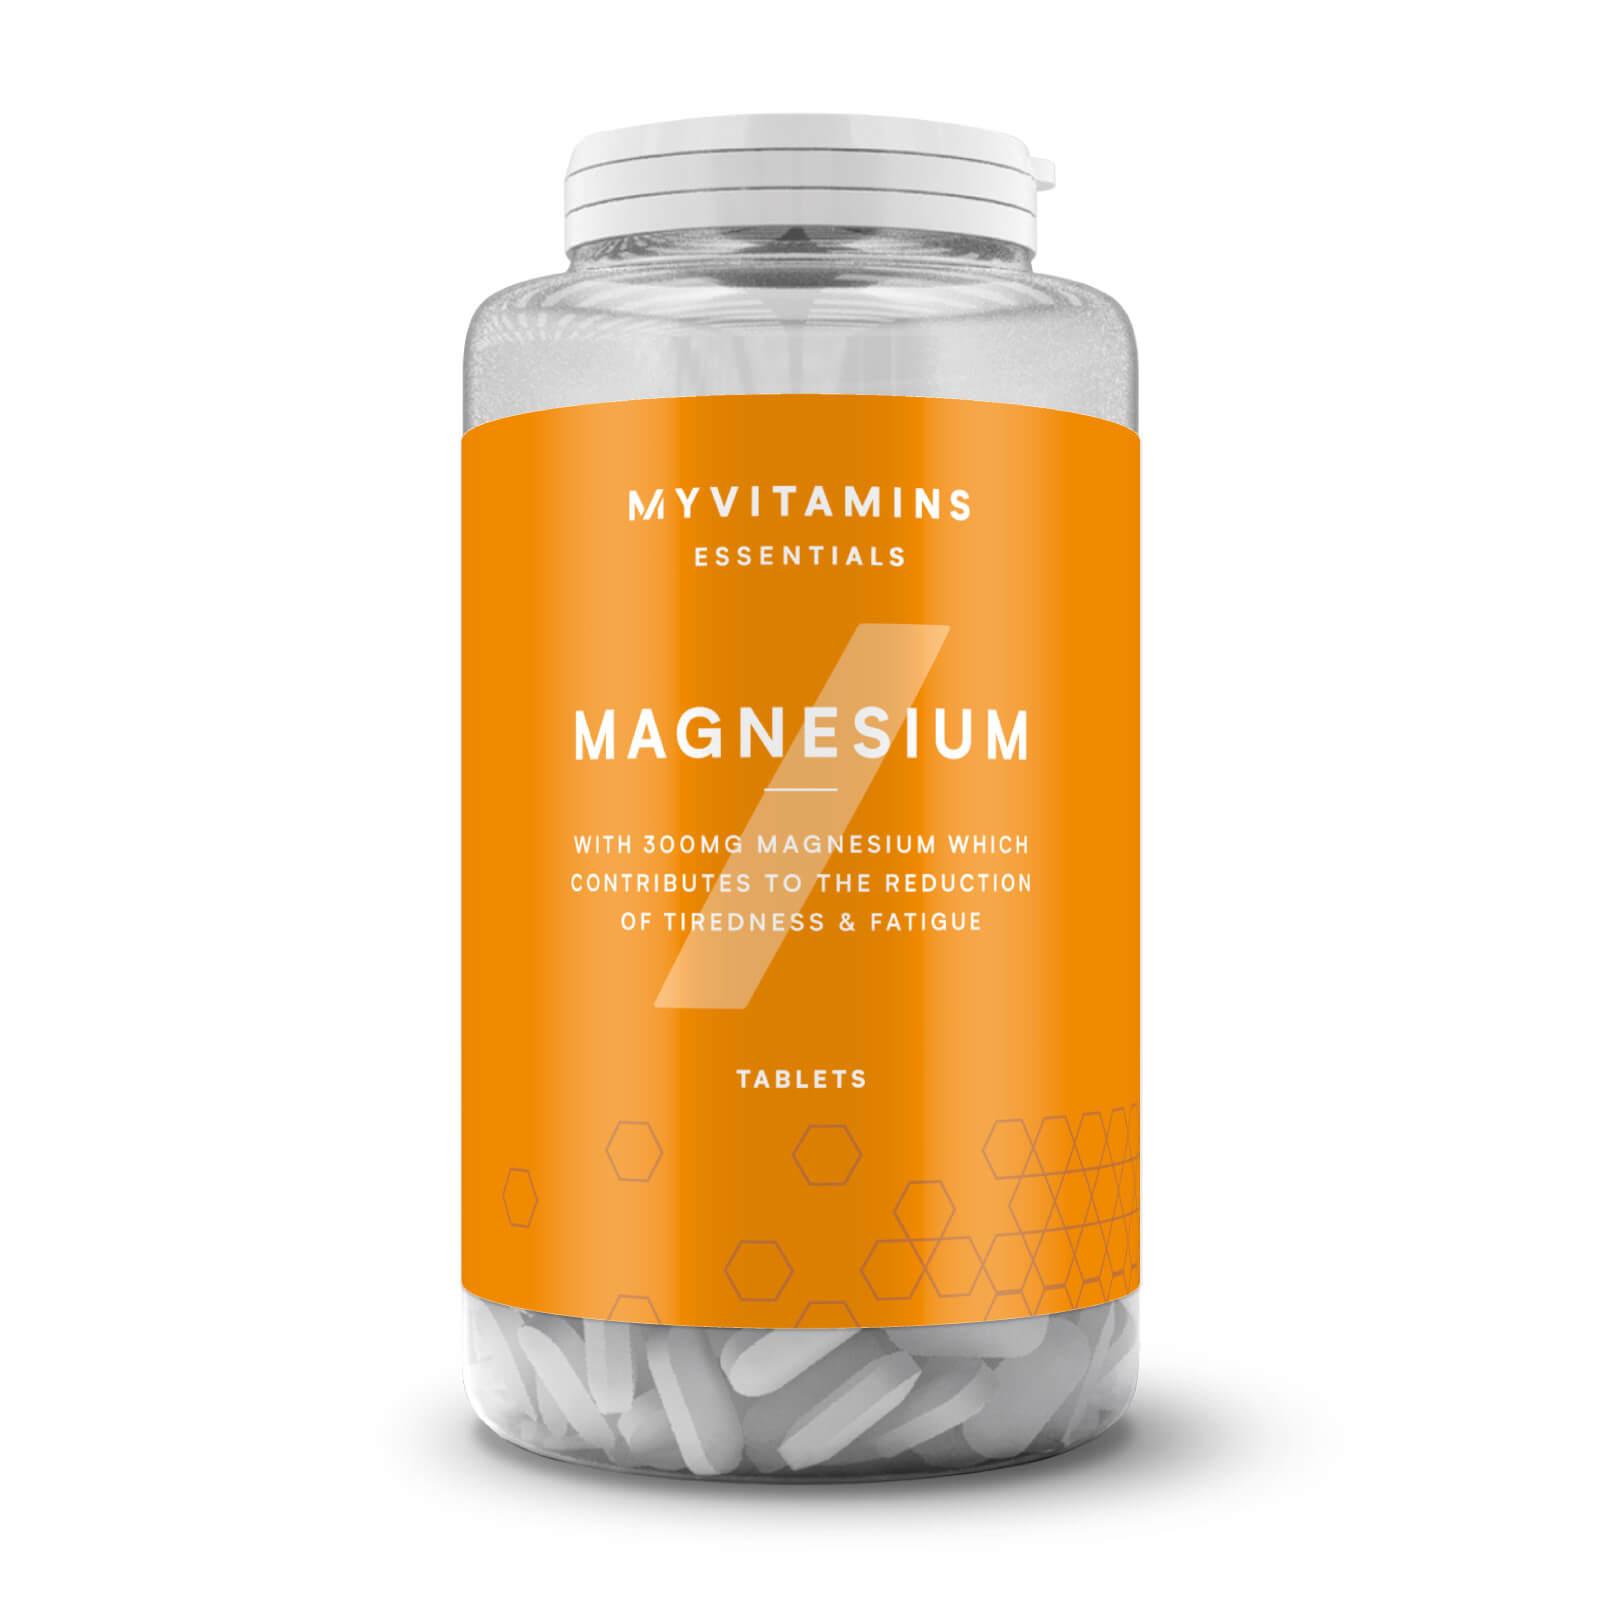 Myvitamins Magnesium 1 Month (90 Tablets)